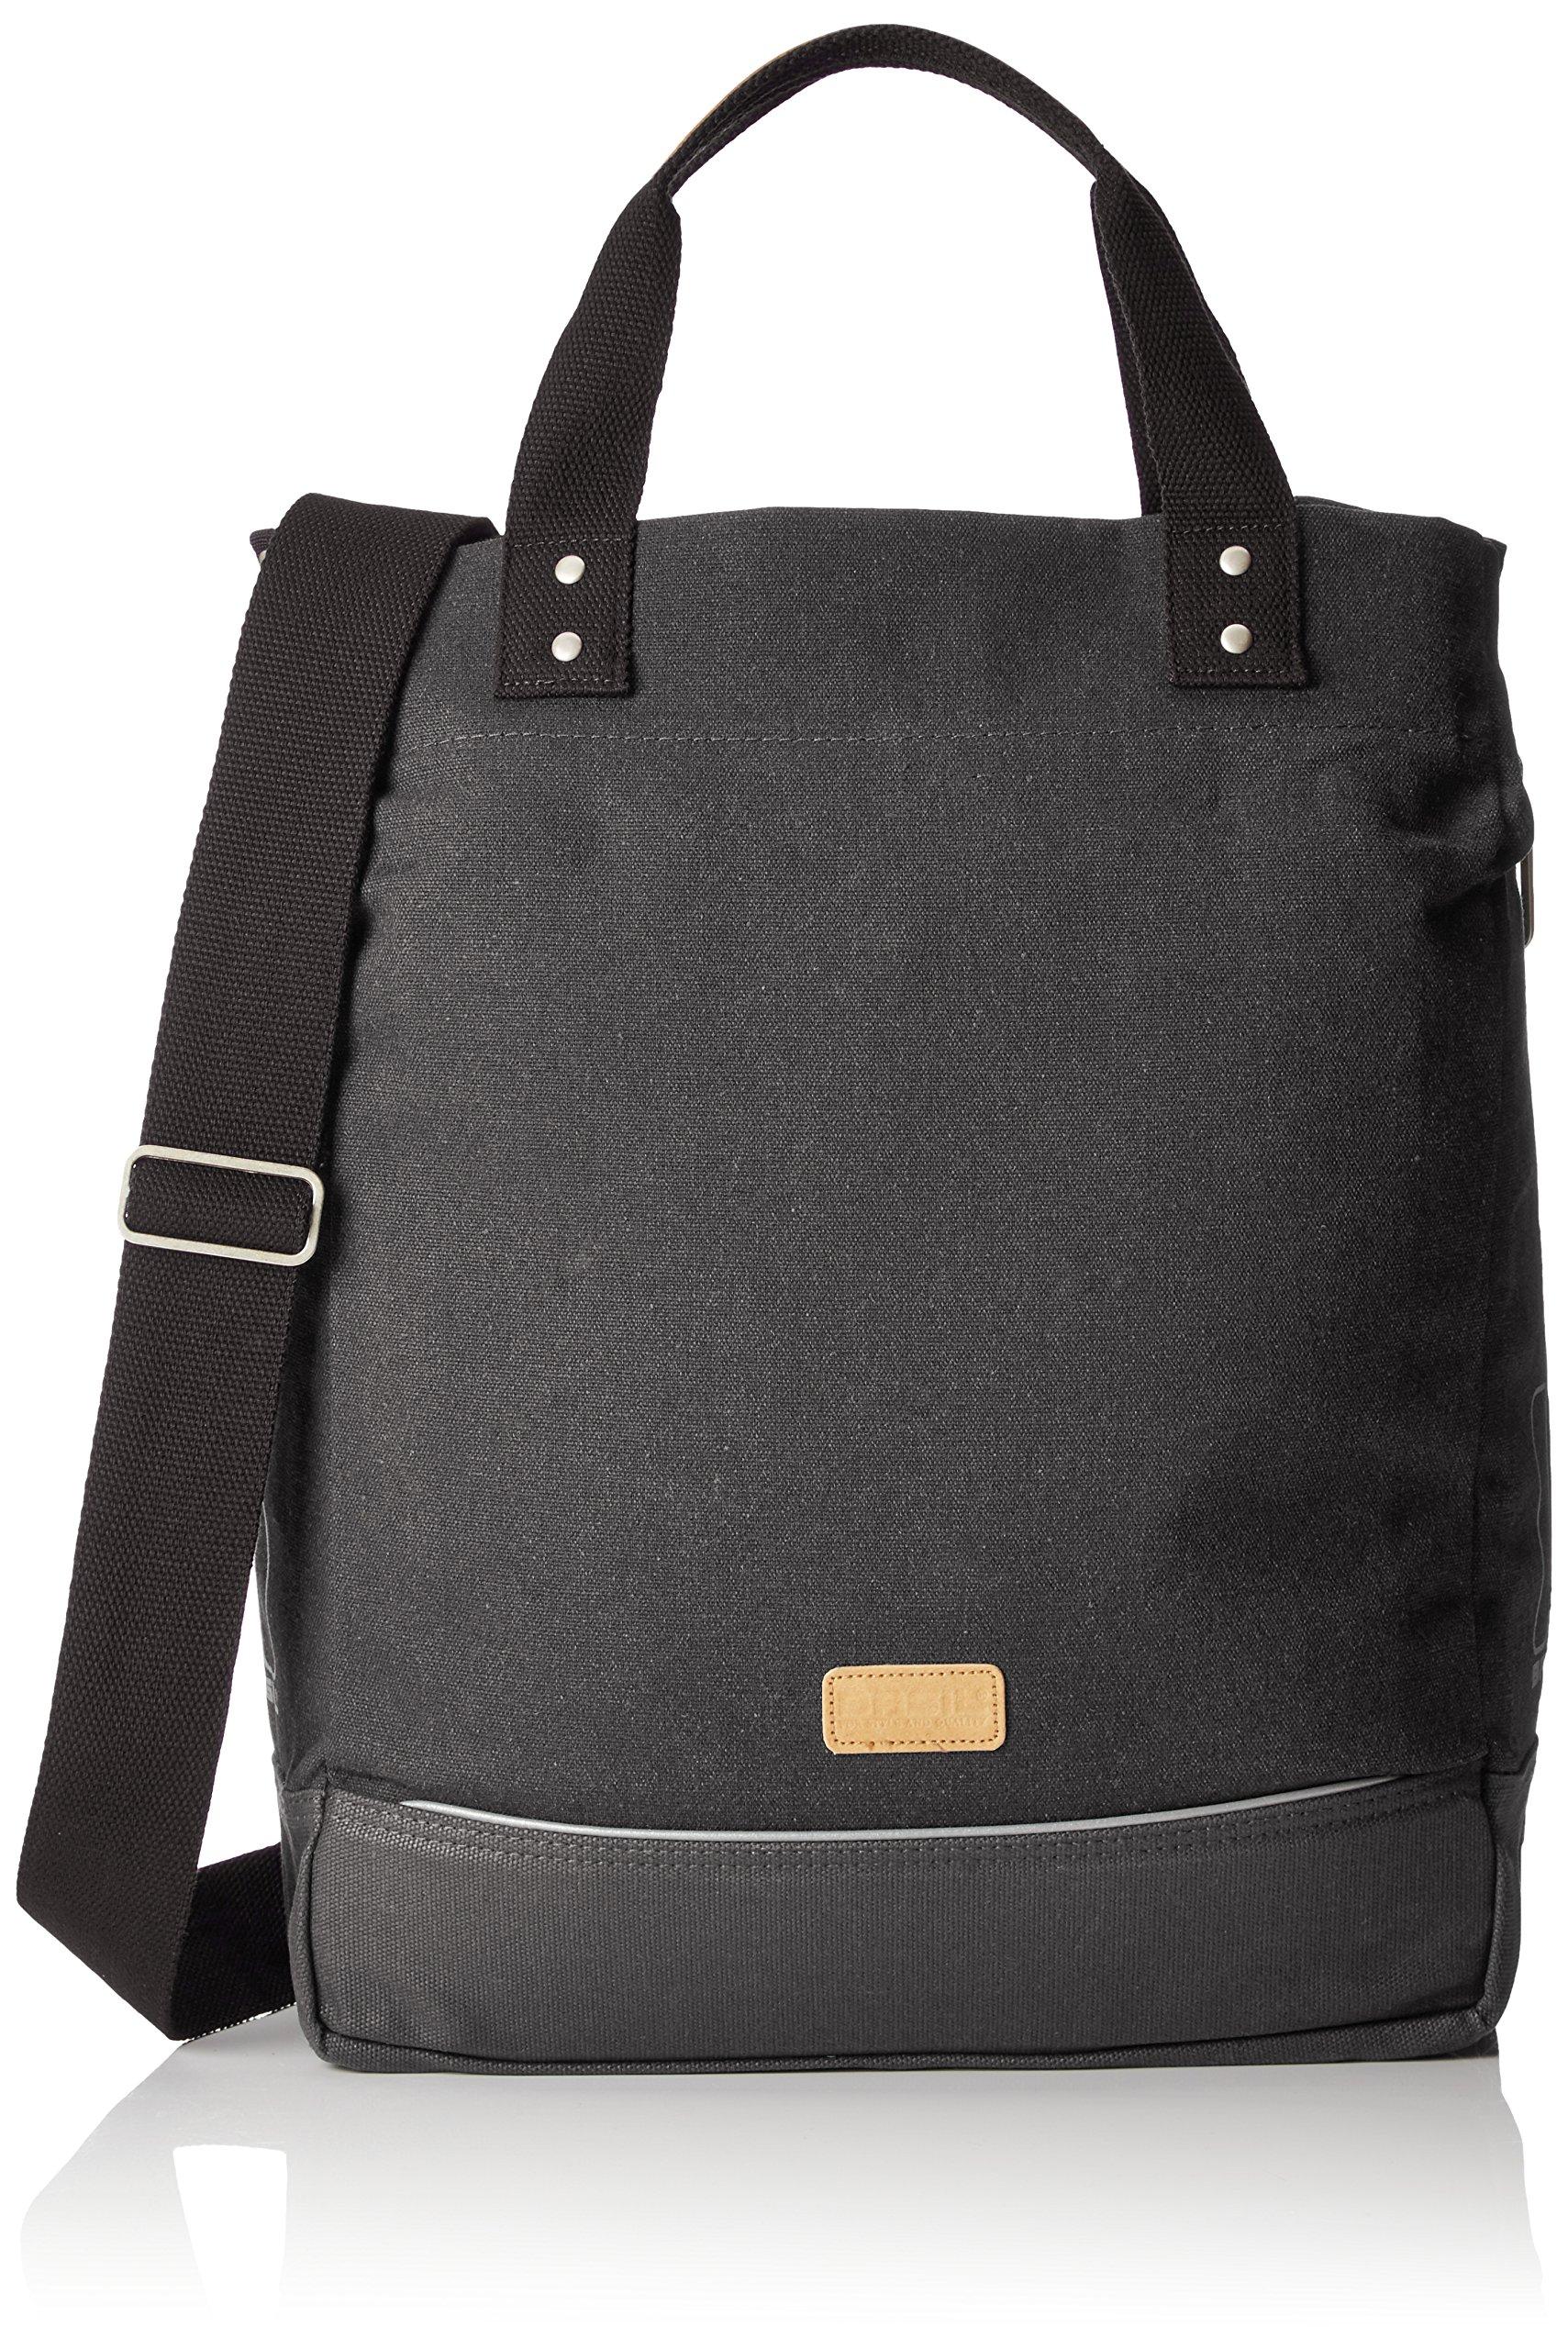 Basil Urban Fold - Sac porte-bagages - noir 2016